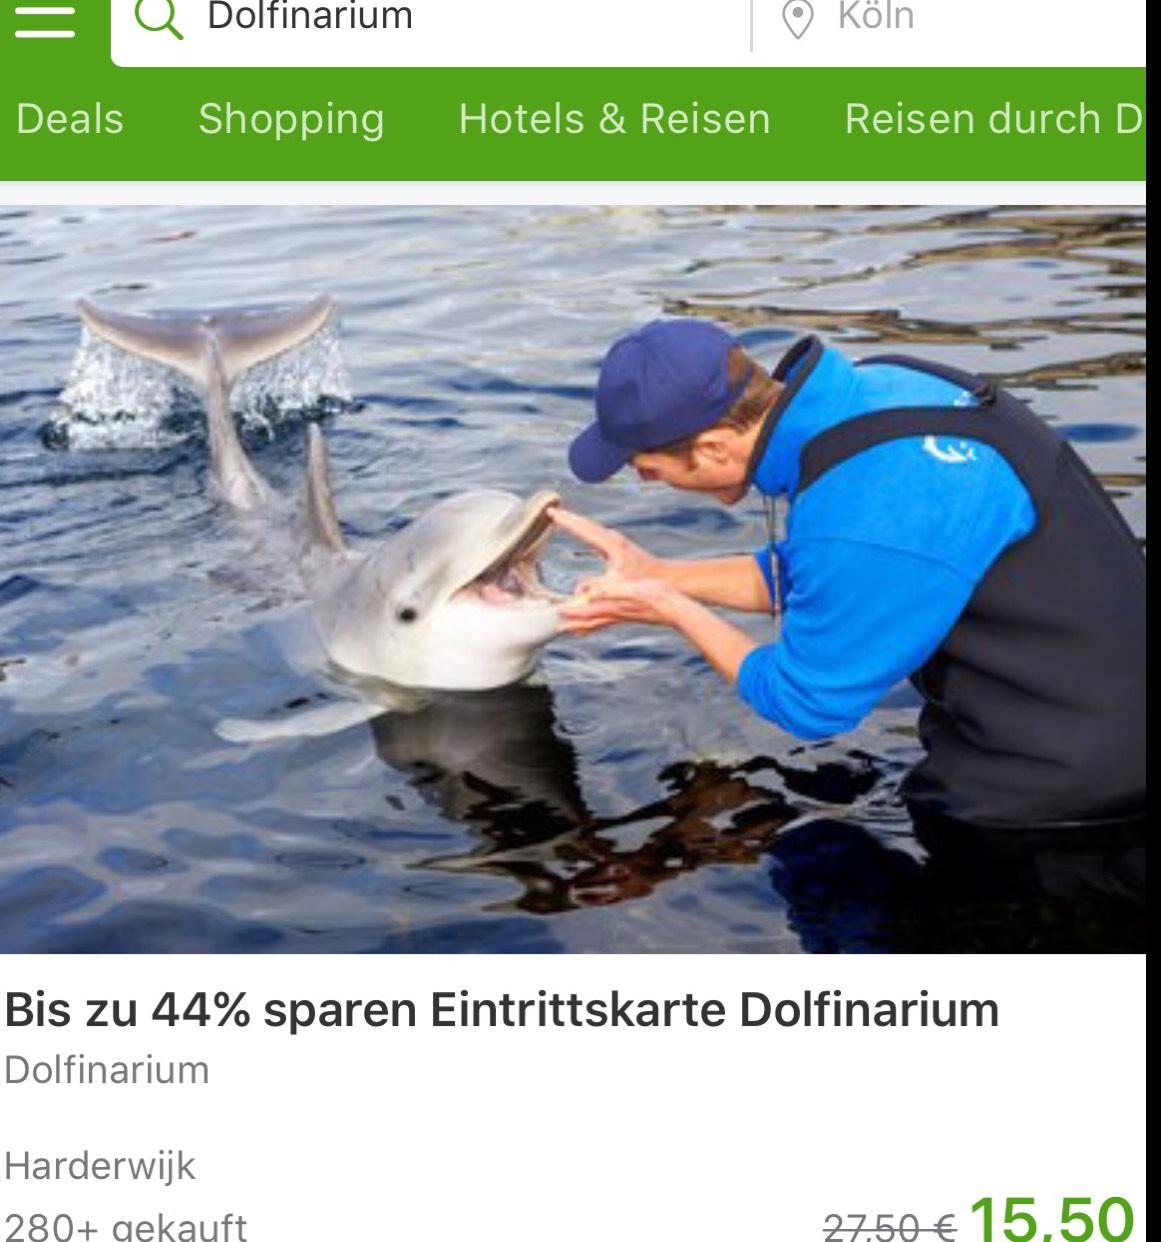 Dolfinarium €13,18 ipv €27,50 @Groupon